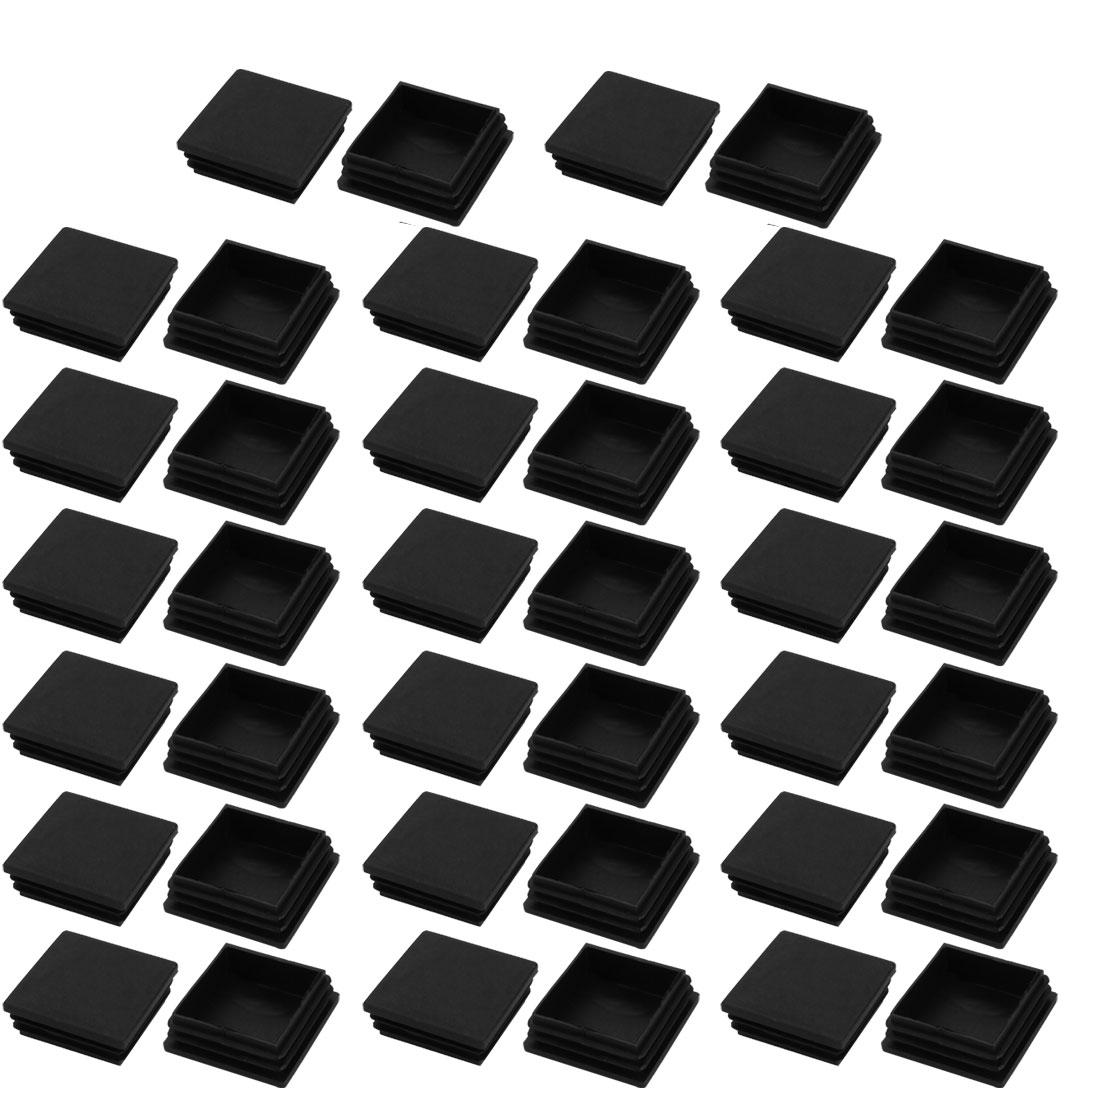 40pcs 50x50mm Black Plastic Square Cabinet Leg Insert Cover Protector